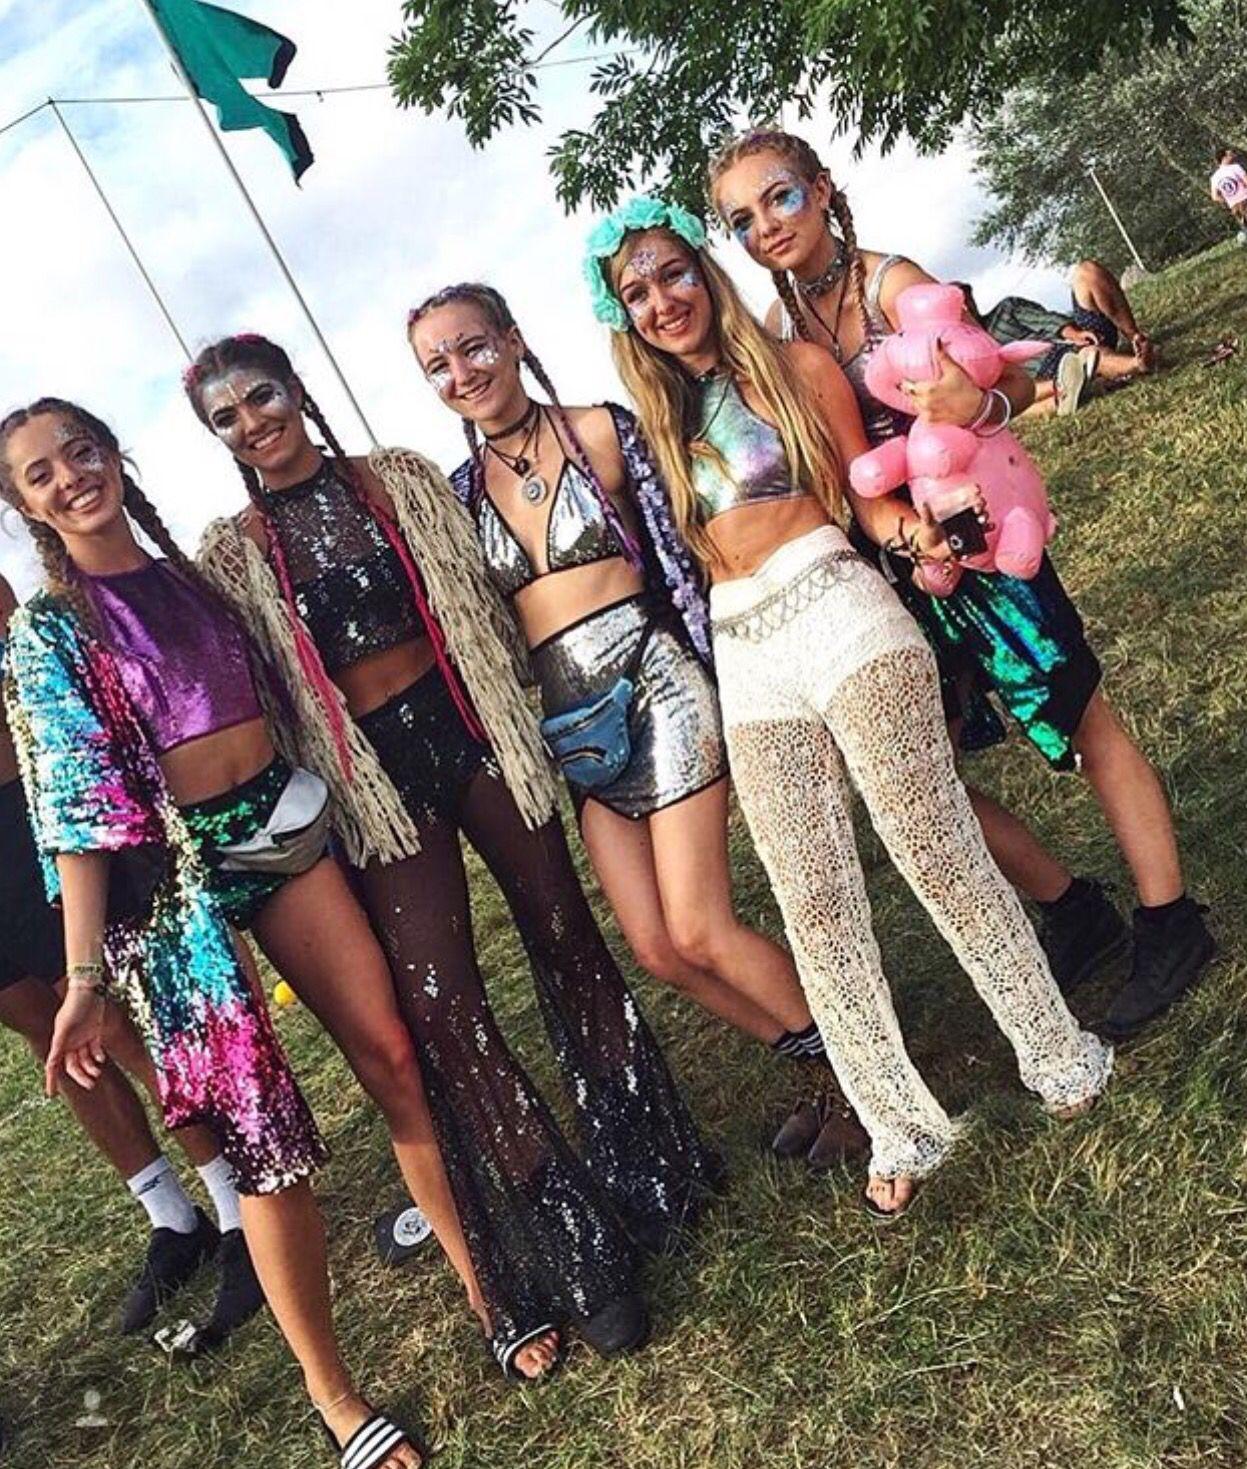 2d680a6289 Festival outfits  festivaloutfits